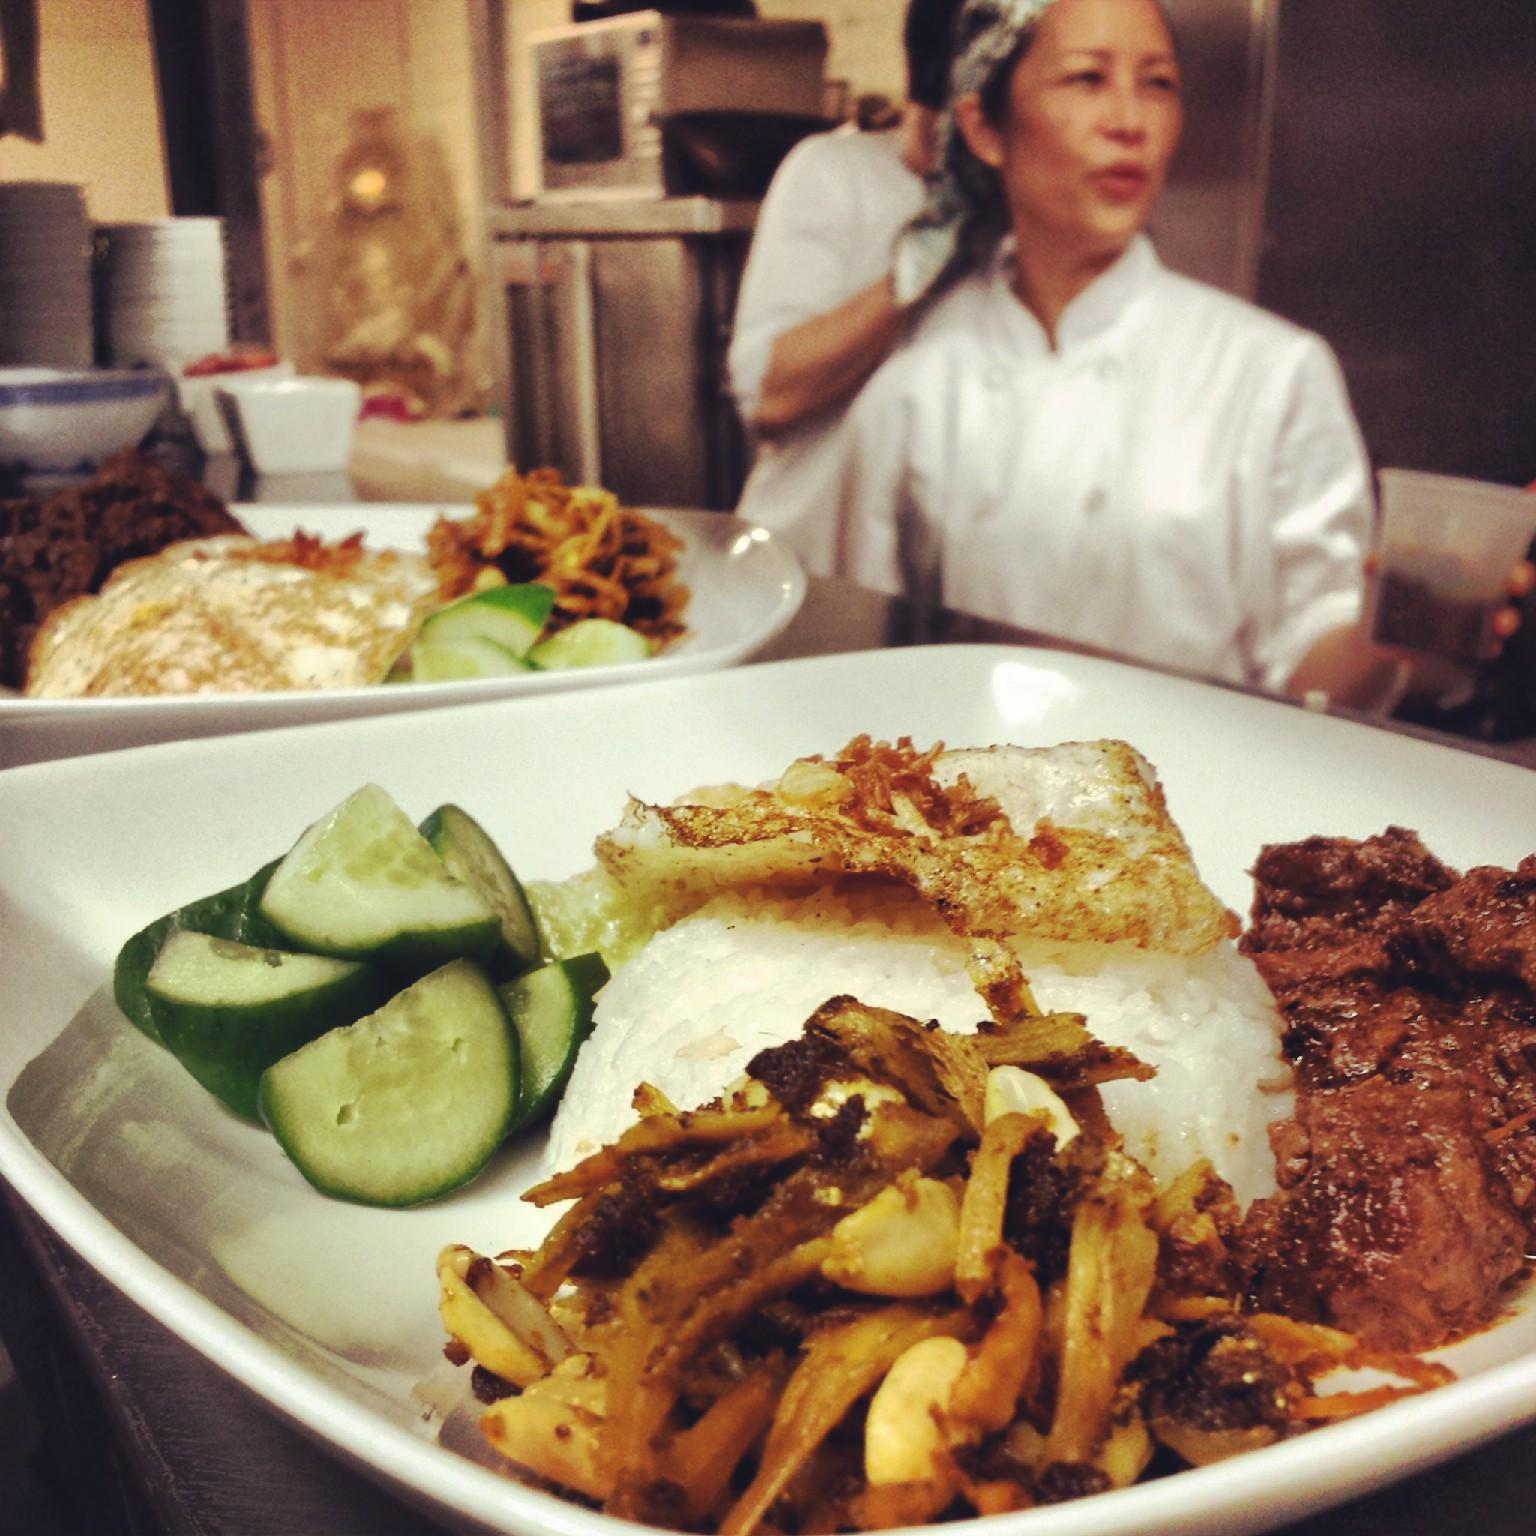 Nasi Lemak   Coconut rice, sambal ikan bilis, rendang short rib, fried egg. Breakfast of Champions